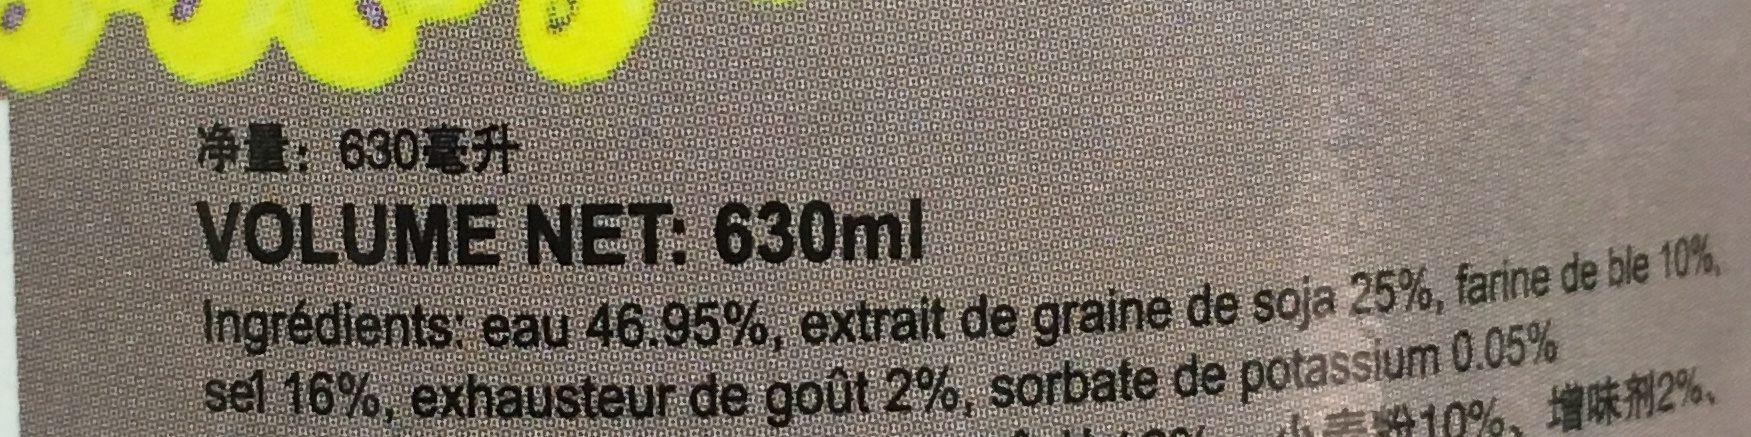 Sauce De Soja SIAVE - Ingredienti - fr